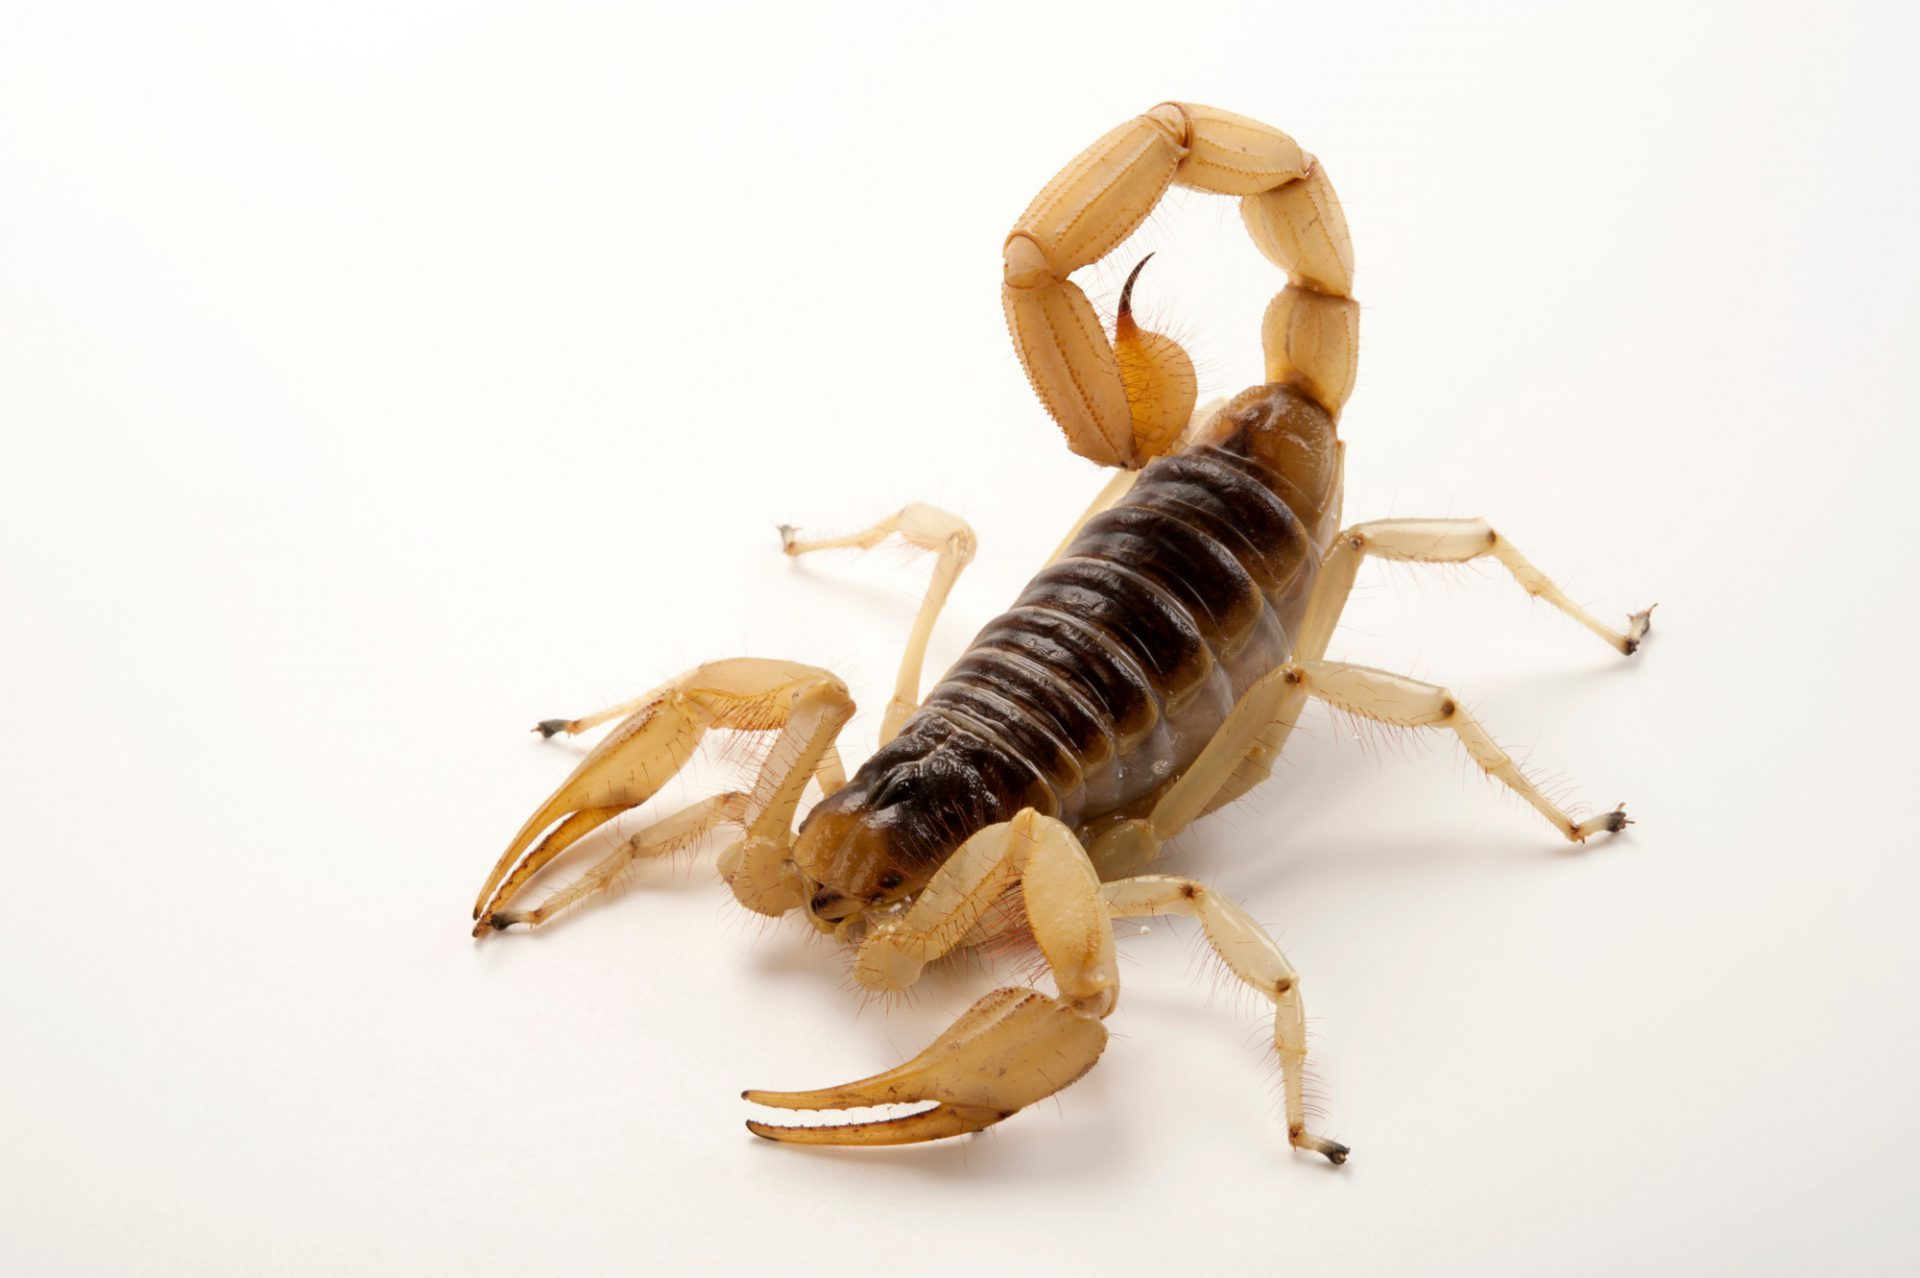 A giant desert hairy scorpion (Hadrurus arizonensis) at the Gladys Porter Zoo in Brownsville, Texas.